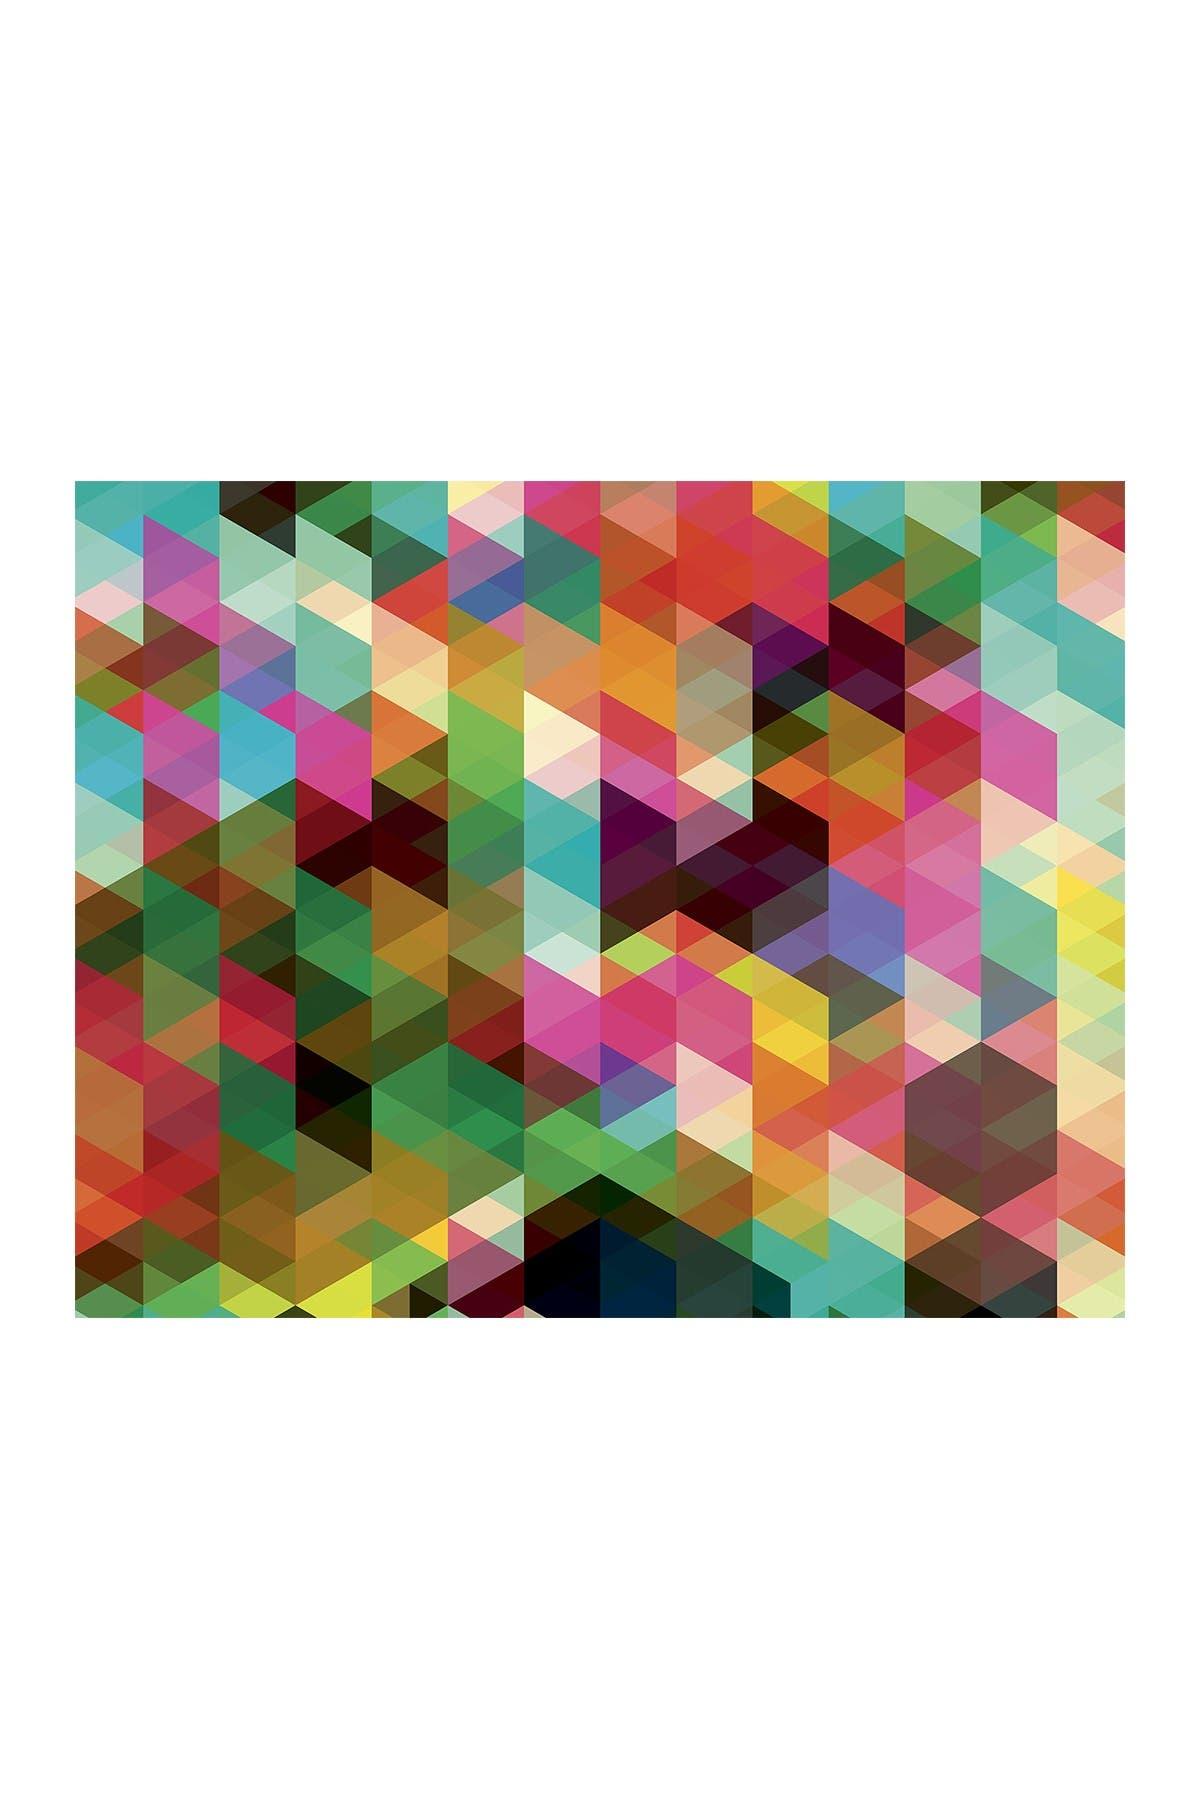 Image of Brewster Home Fashions Geometrix Wall Mural